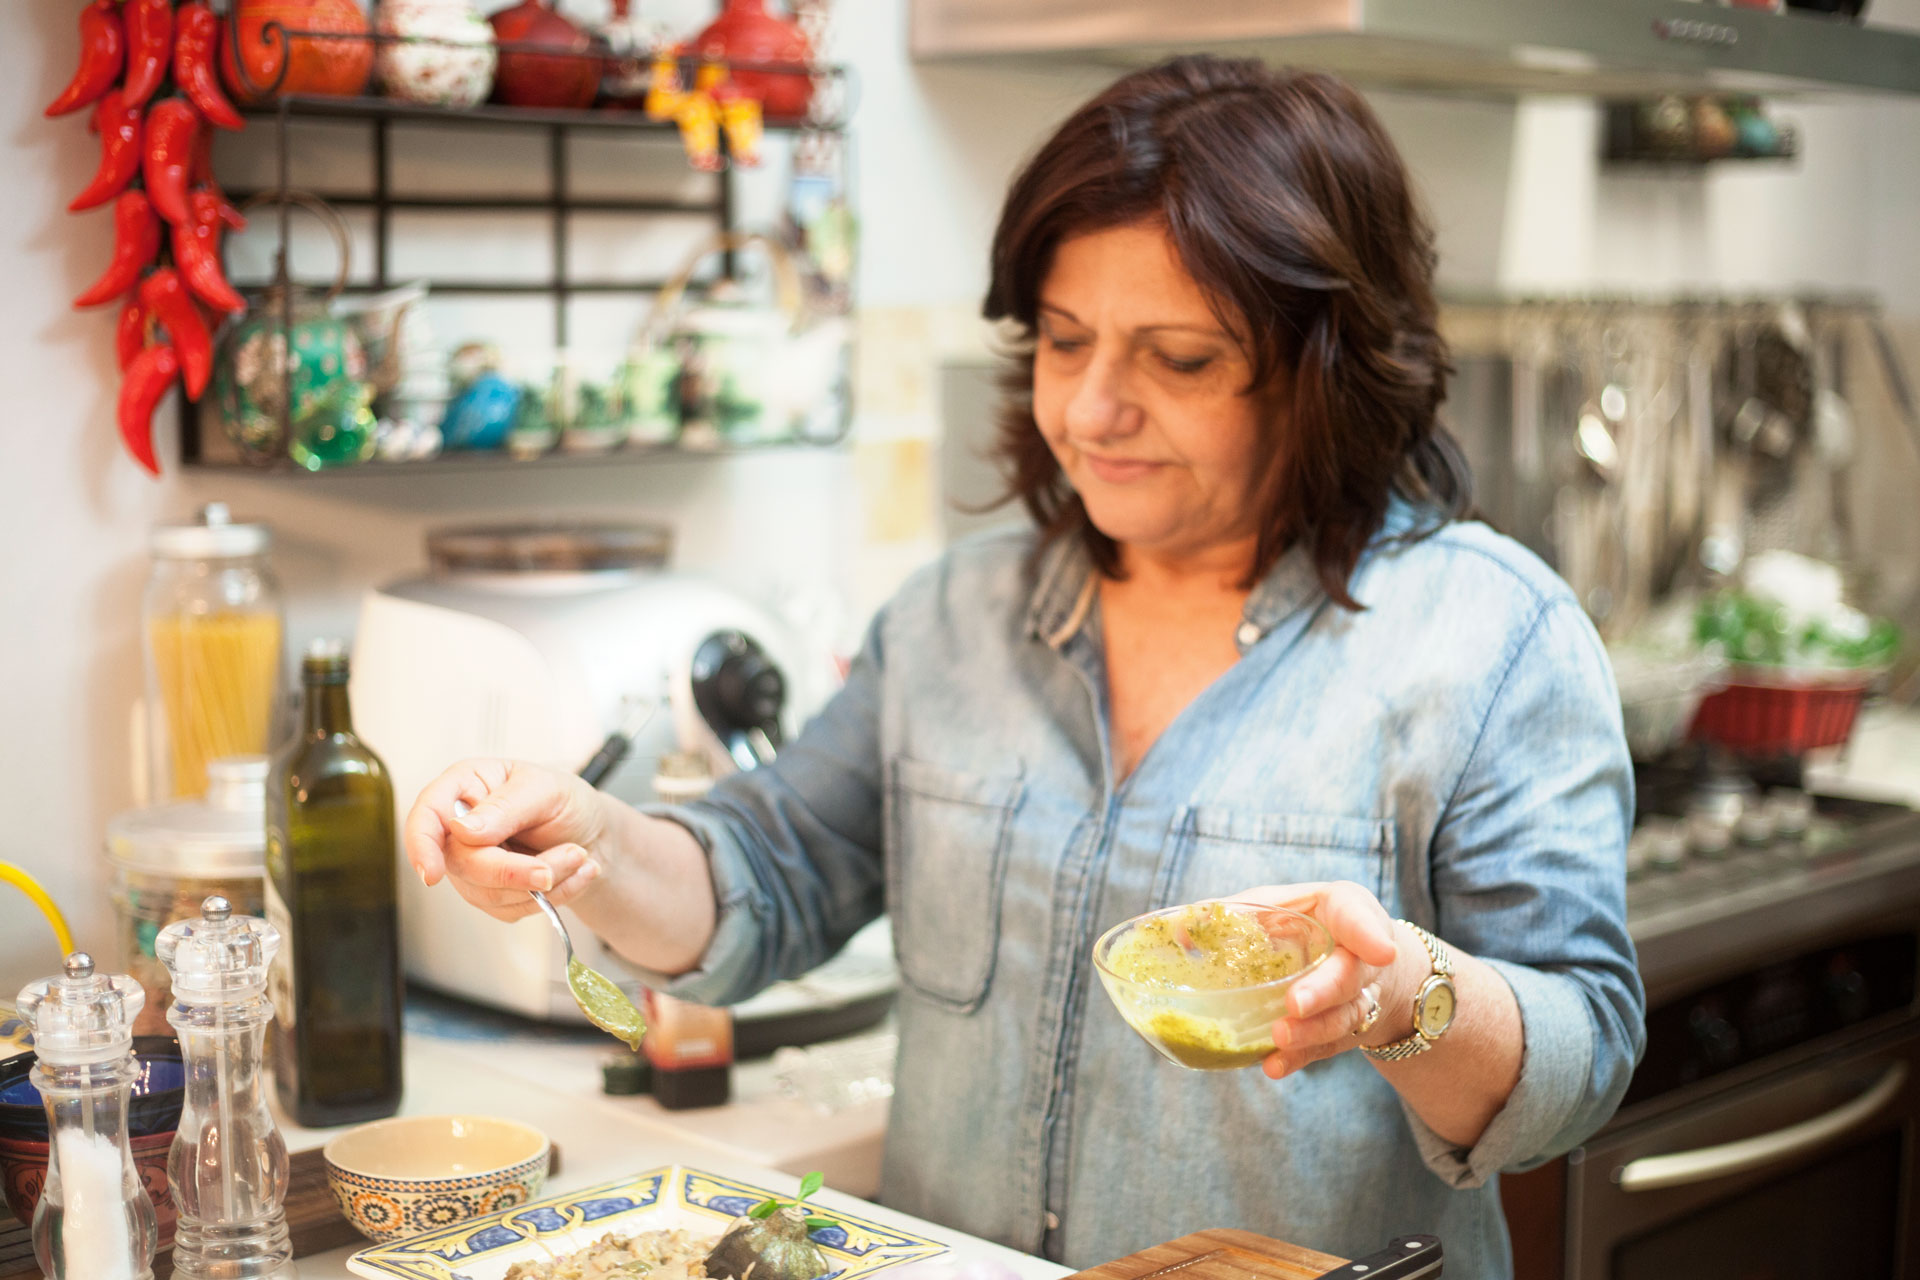 Sara-Prezman-making-her-delicious-and-healthy-Aubergine-Salad-recipe-Foodadit